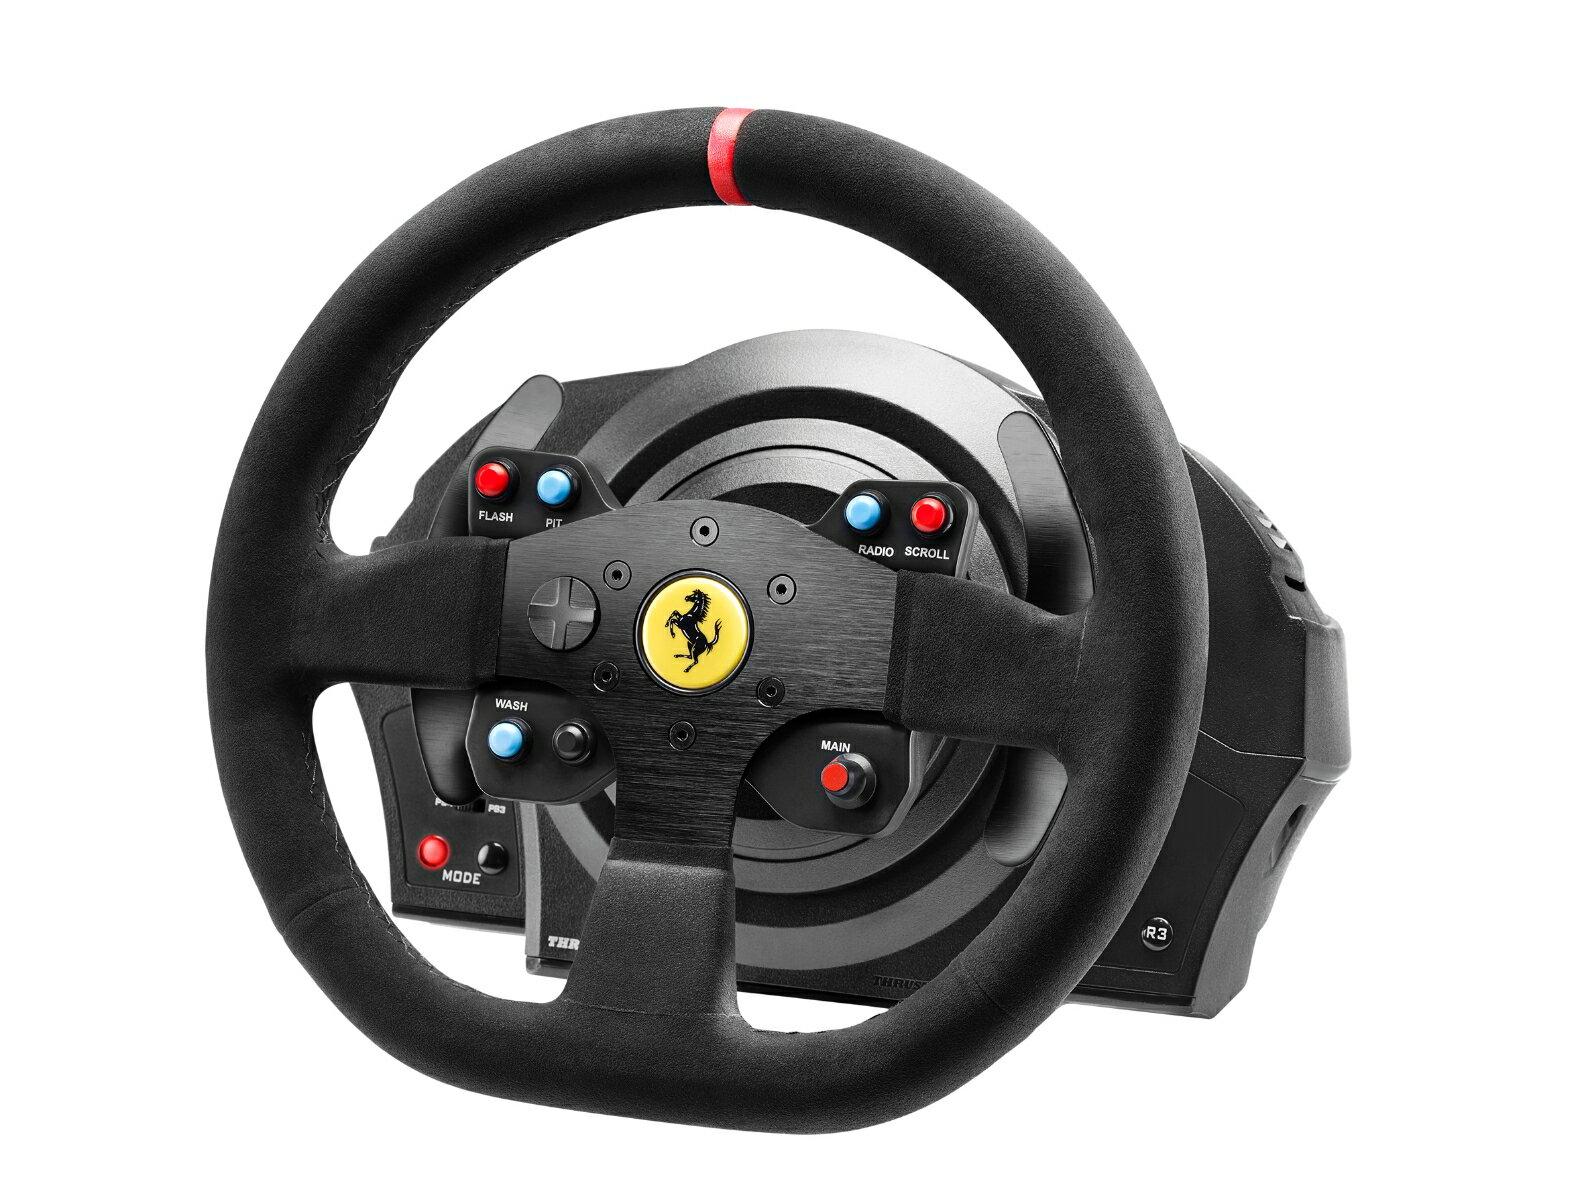 T300 Ferrari Integral Racing Wheel Alcantara Edition for PlayStation4/PlayStation3